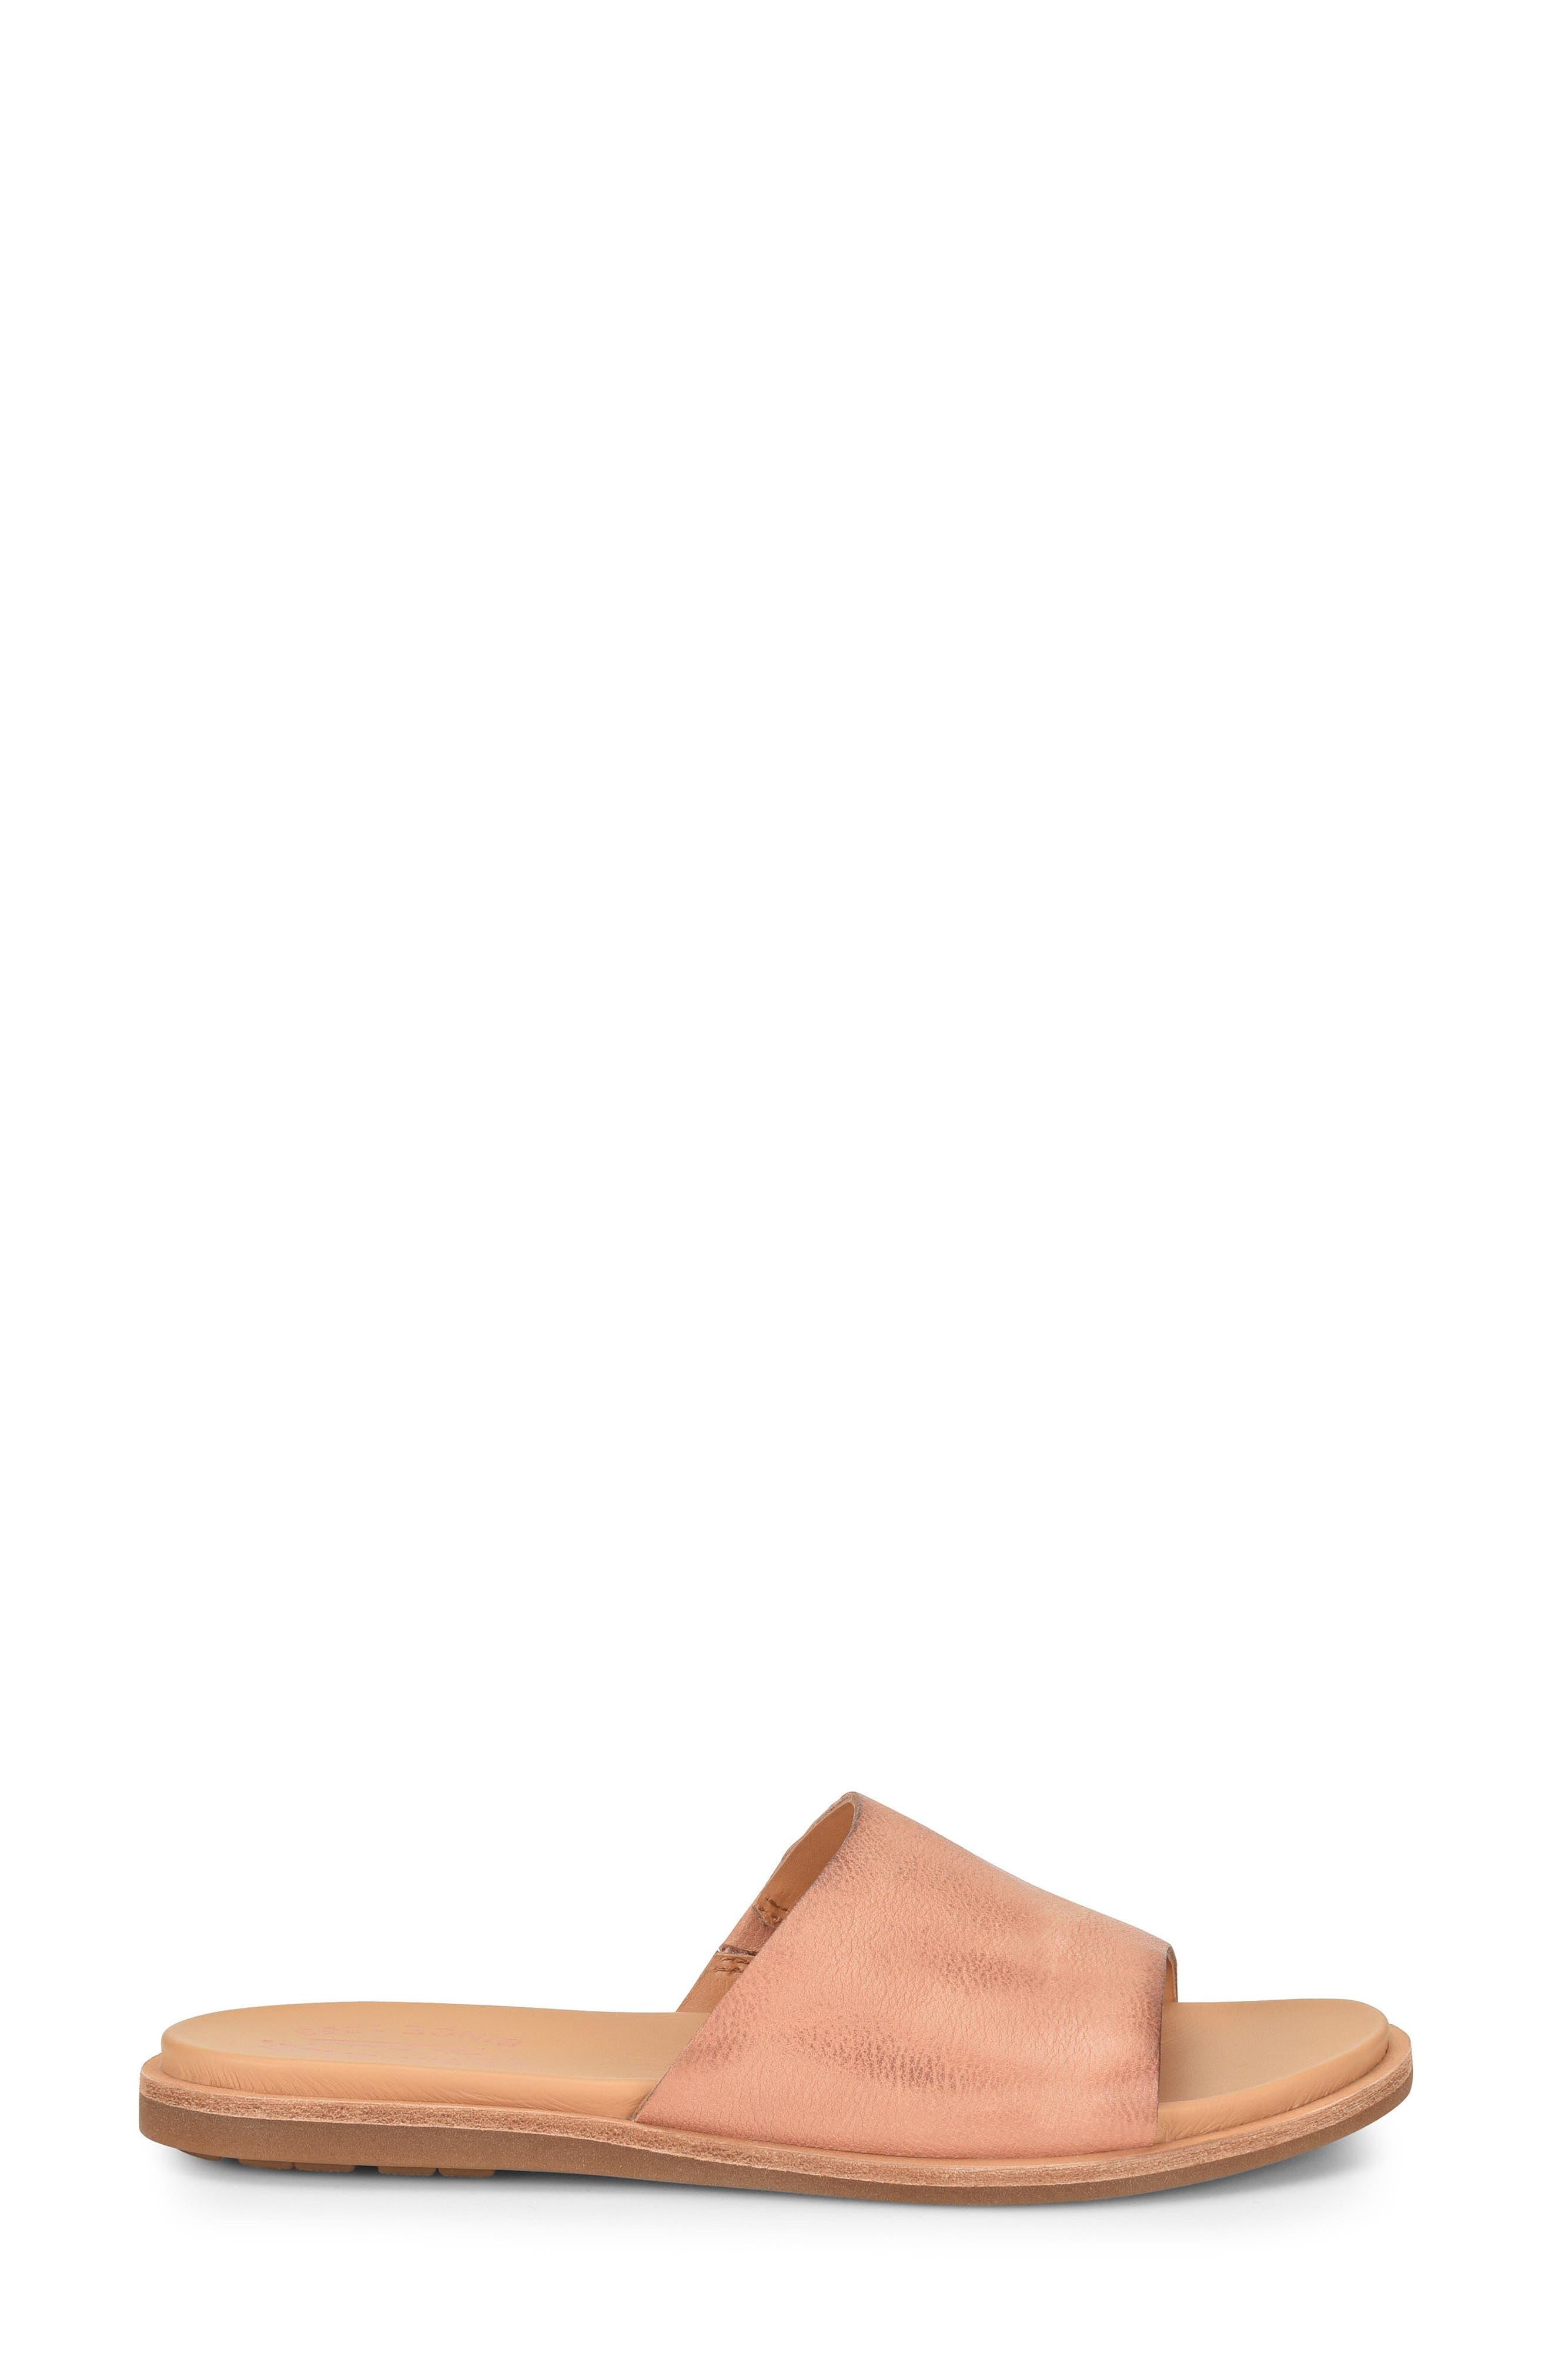 Gila Slide Sandal,                             Alternate thumbnail 3, color,                             Blush Leather